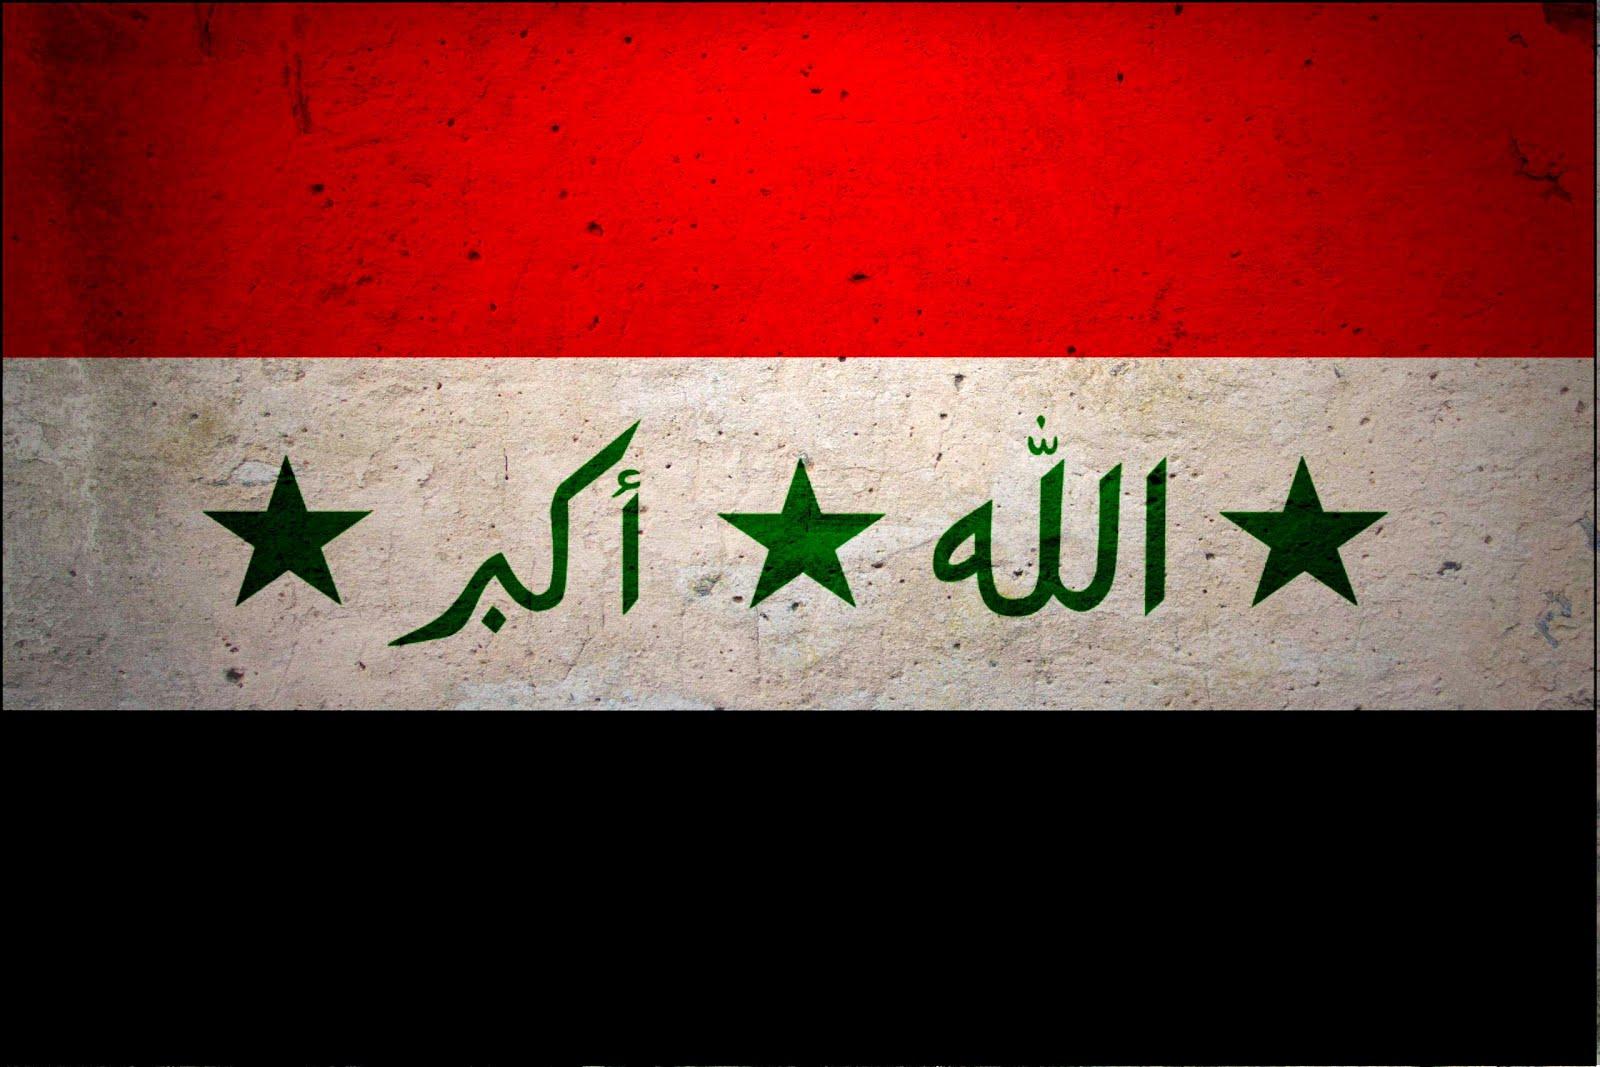 http://1.bp.blogspot.com/--EmHfHPaJpE/Tz0XPXu0VHI/AAAAAAAAAMw/Nq4tHt_eXYw/s1600/Flag-of-Iraq-wallpaper.jpg